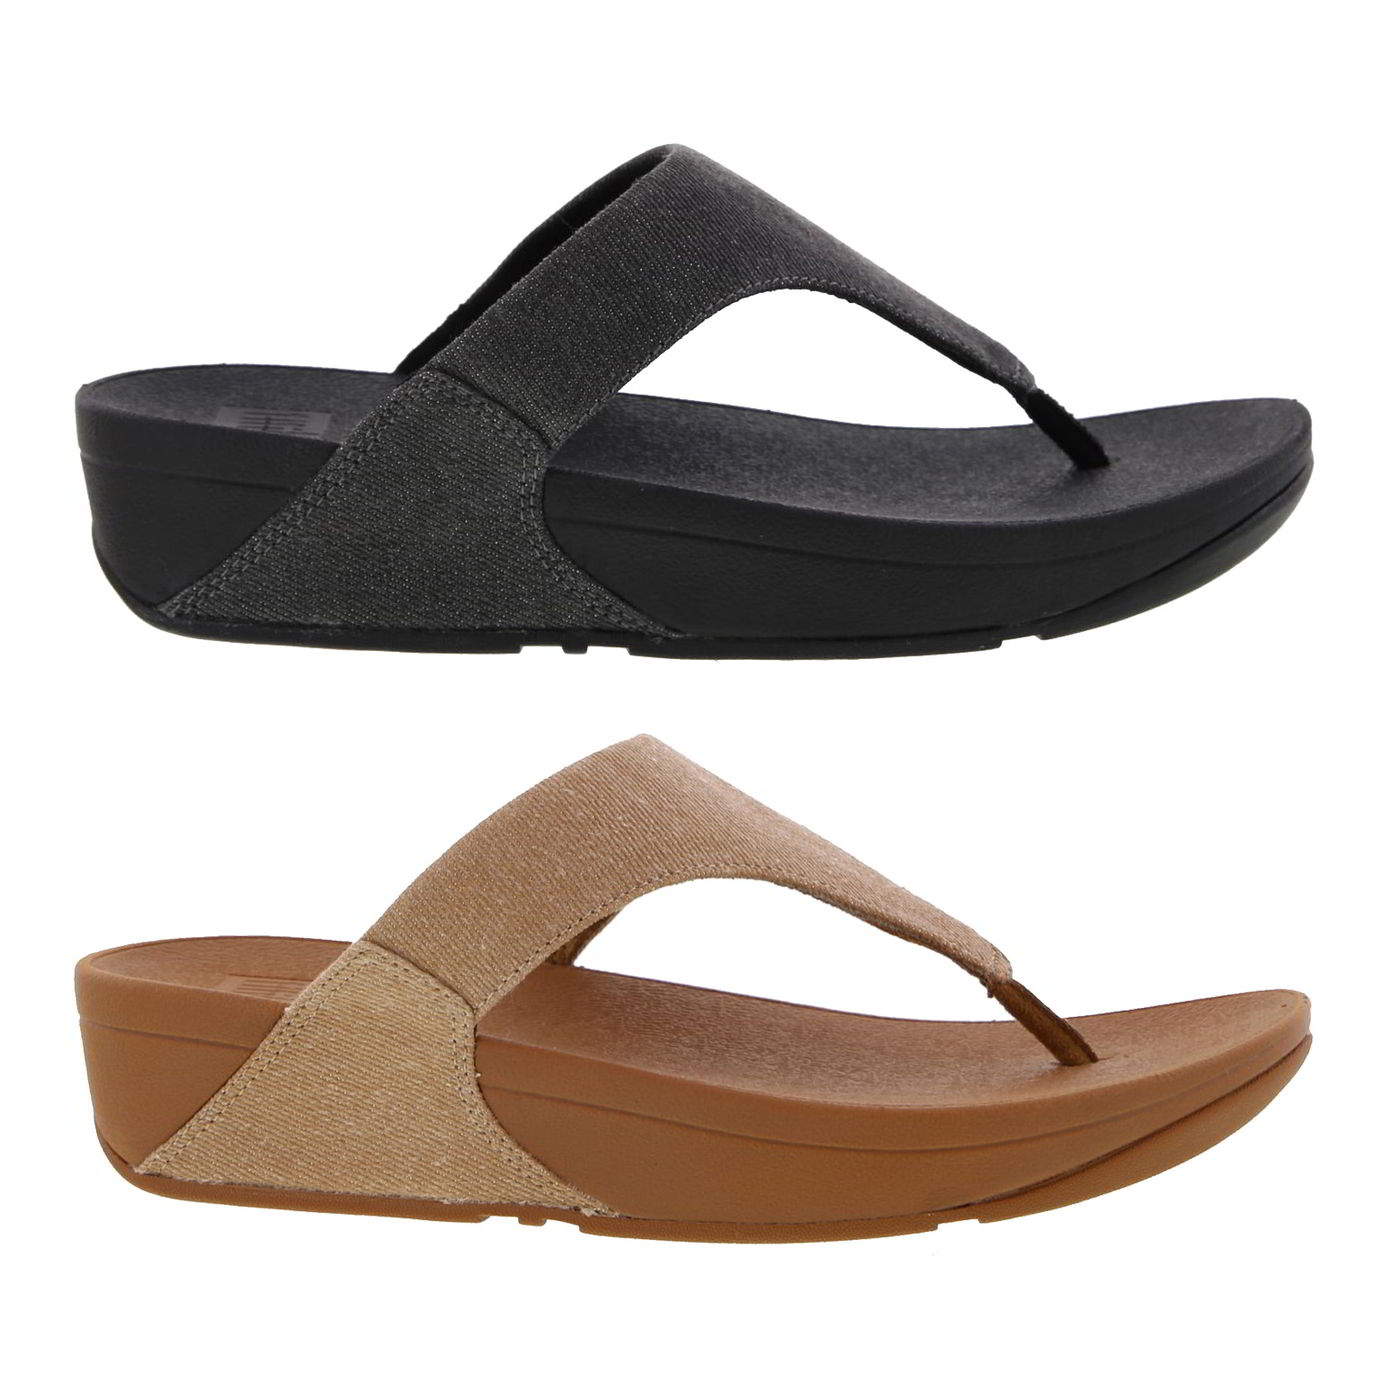 55ef9c293 Details about fitflop lulu toe post womens canvas black beige sandals flip  flops size jpg 1400x1400